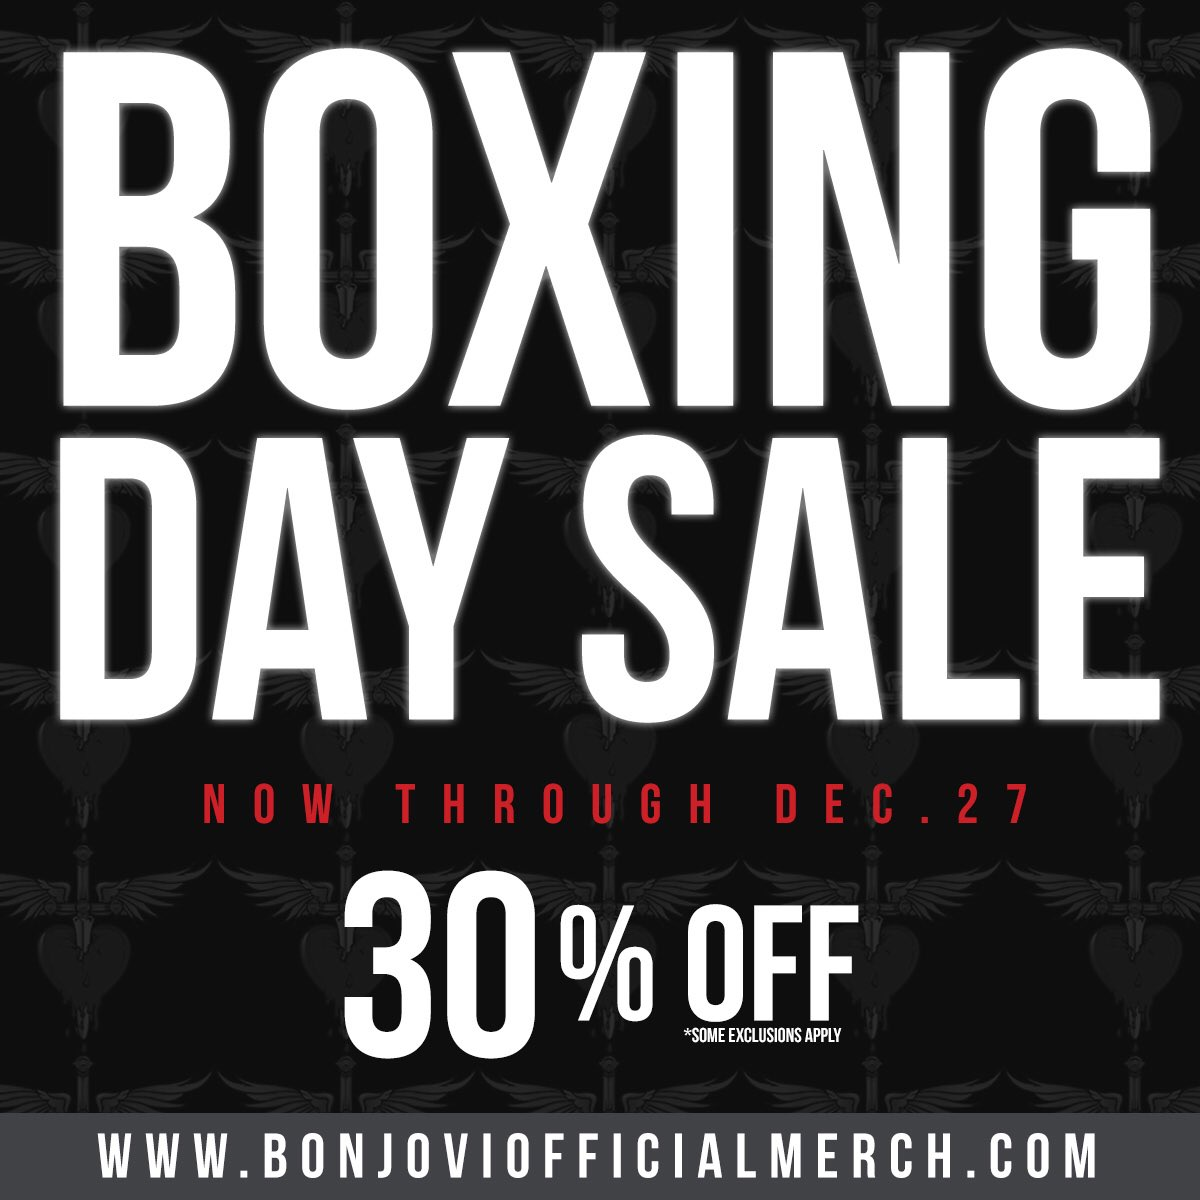 Save 30% off on official merchandise now through Wednesday!   https://t.co/qj12MamKWZ https://t.co/CroqJlLIAk